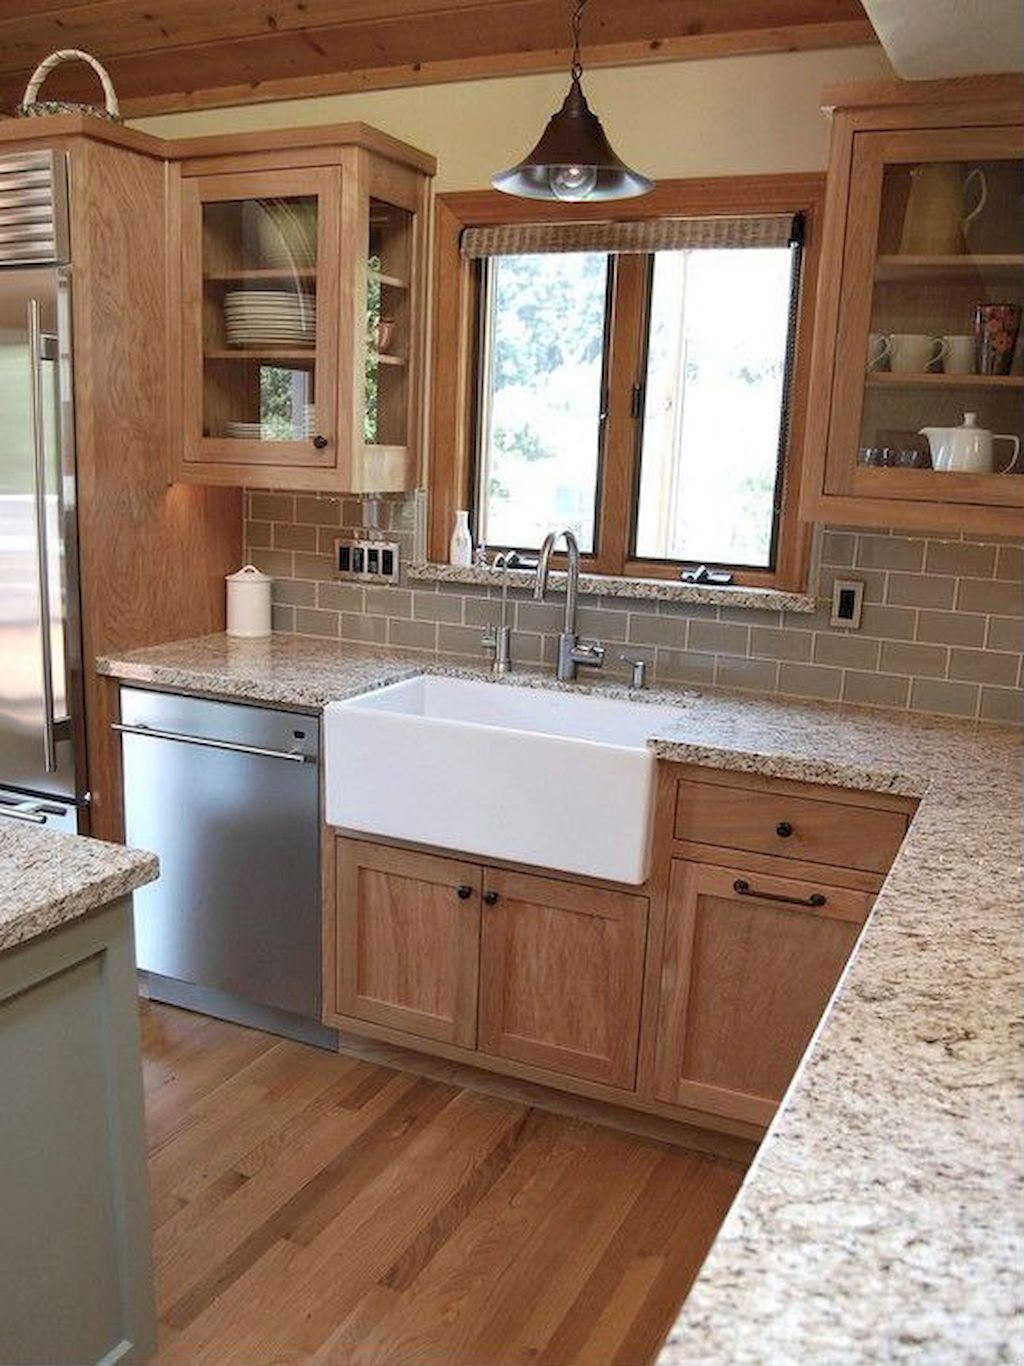 100 Best Oak Kitchen Cabinets Ideas Decoration For Farmhouse Style 65 Kitchen Design Kitchen Styling